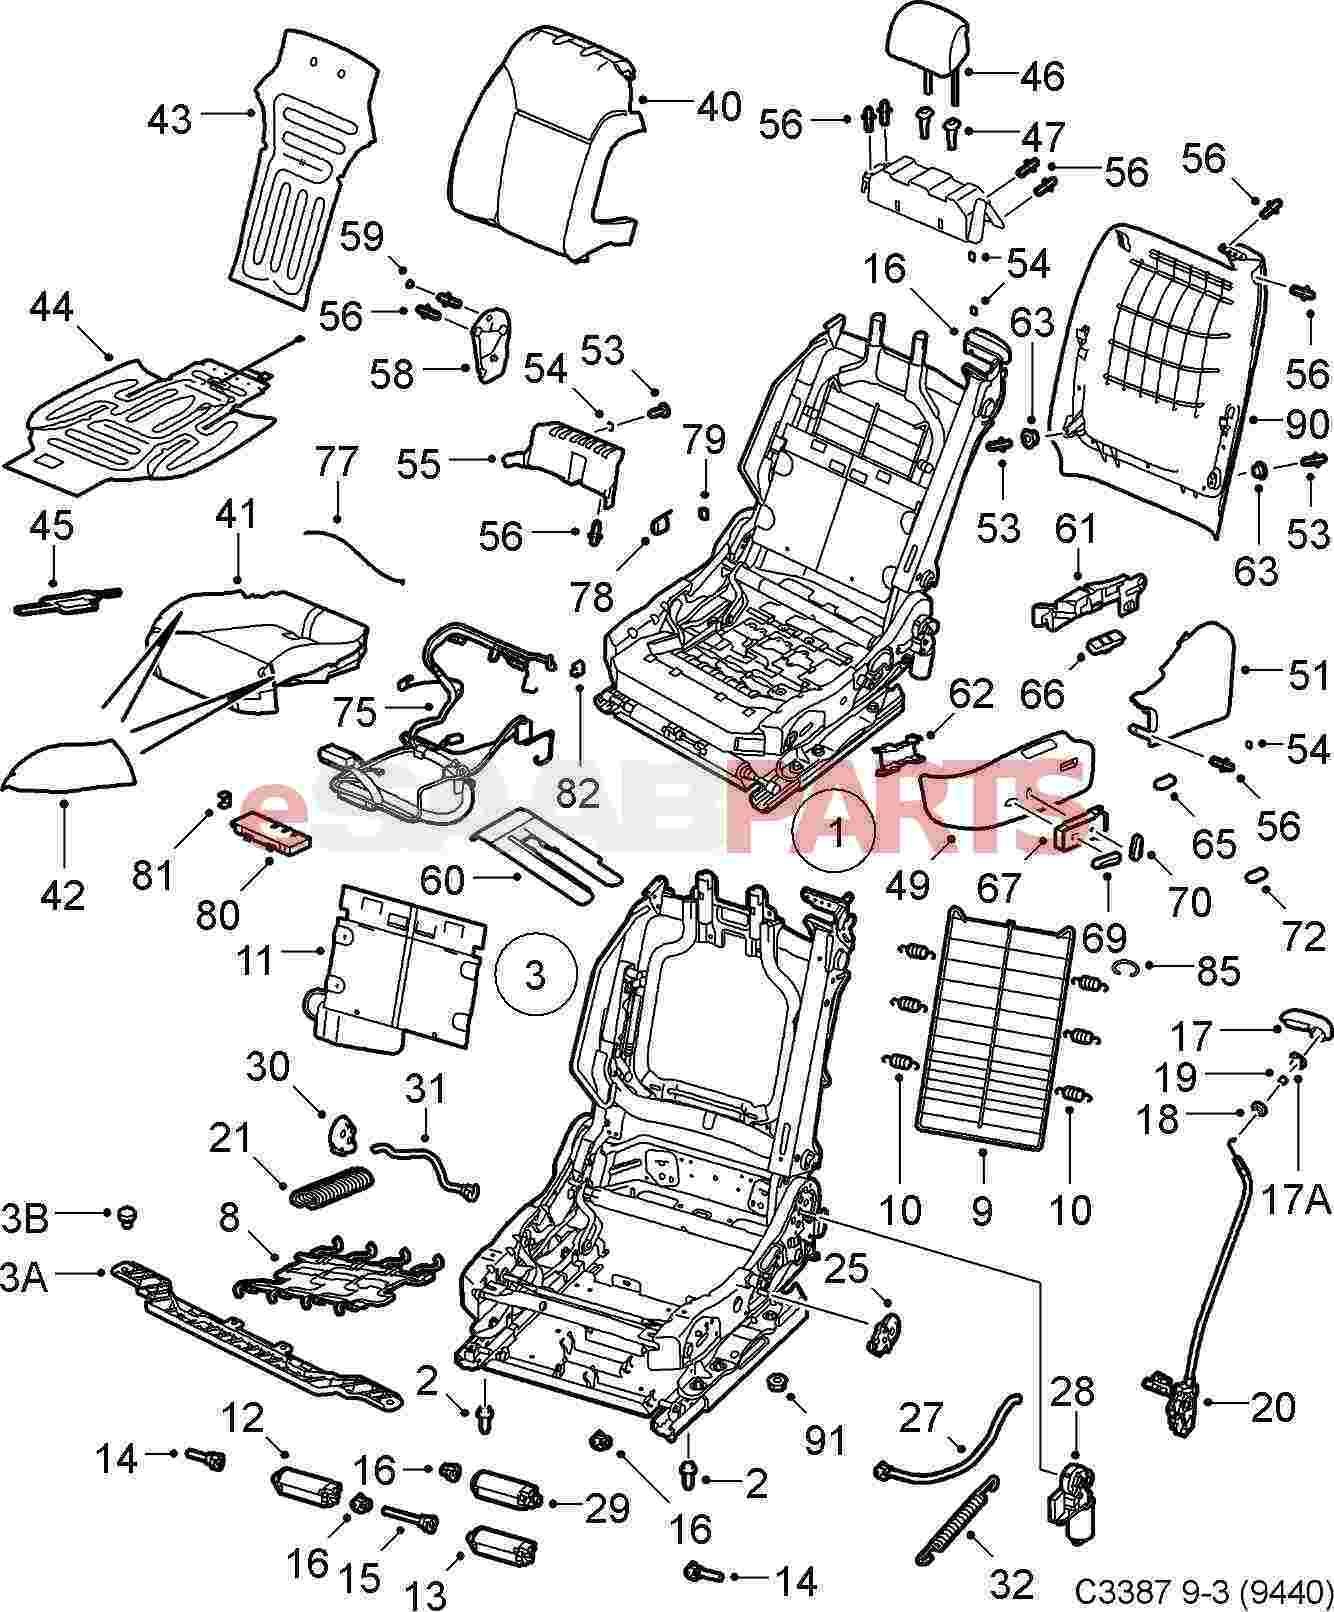 Saab Passenger Seat Occupancy Sensor